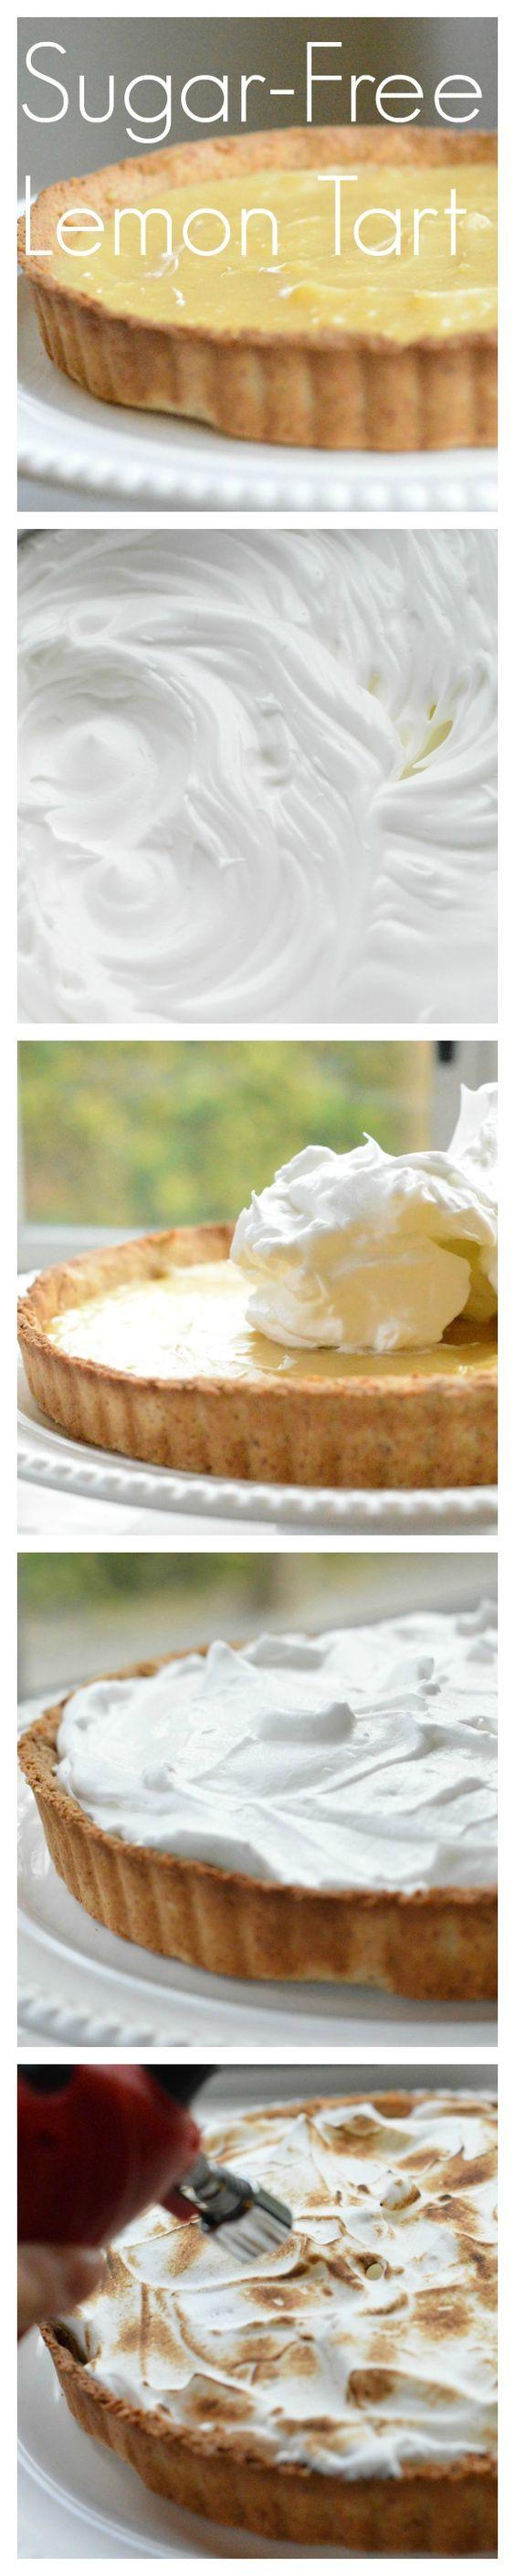 Sugar Free Lemon Tart by www.sweetashoney.co #lowcarbcrust #glutenfreepie…